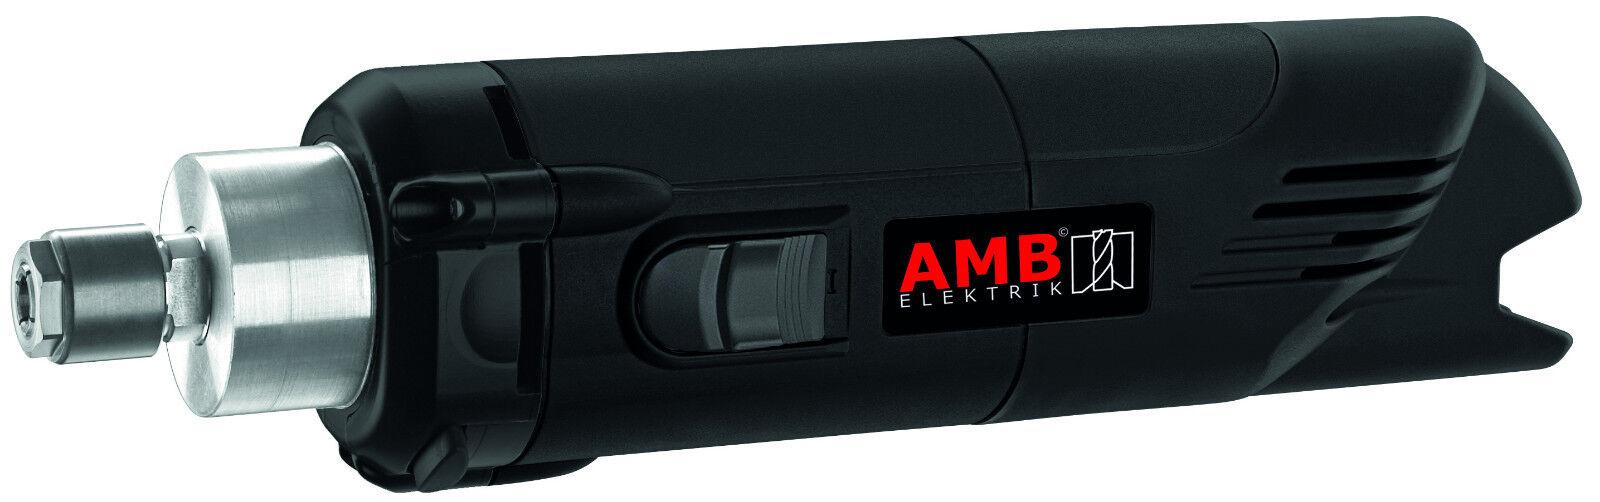 AMB 1050 FME-1 Fräsmotor, Sonderotition, NEU  bereits ab 3.500 U min